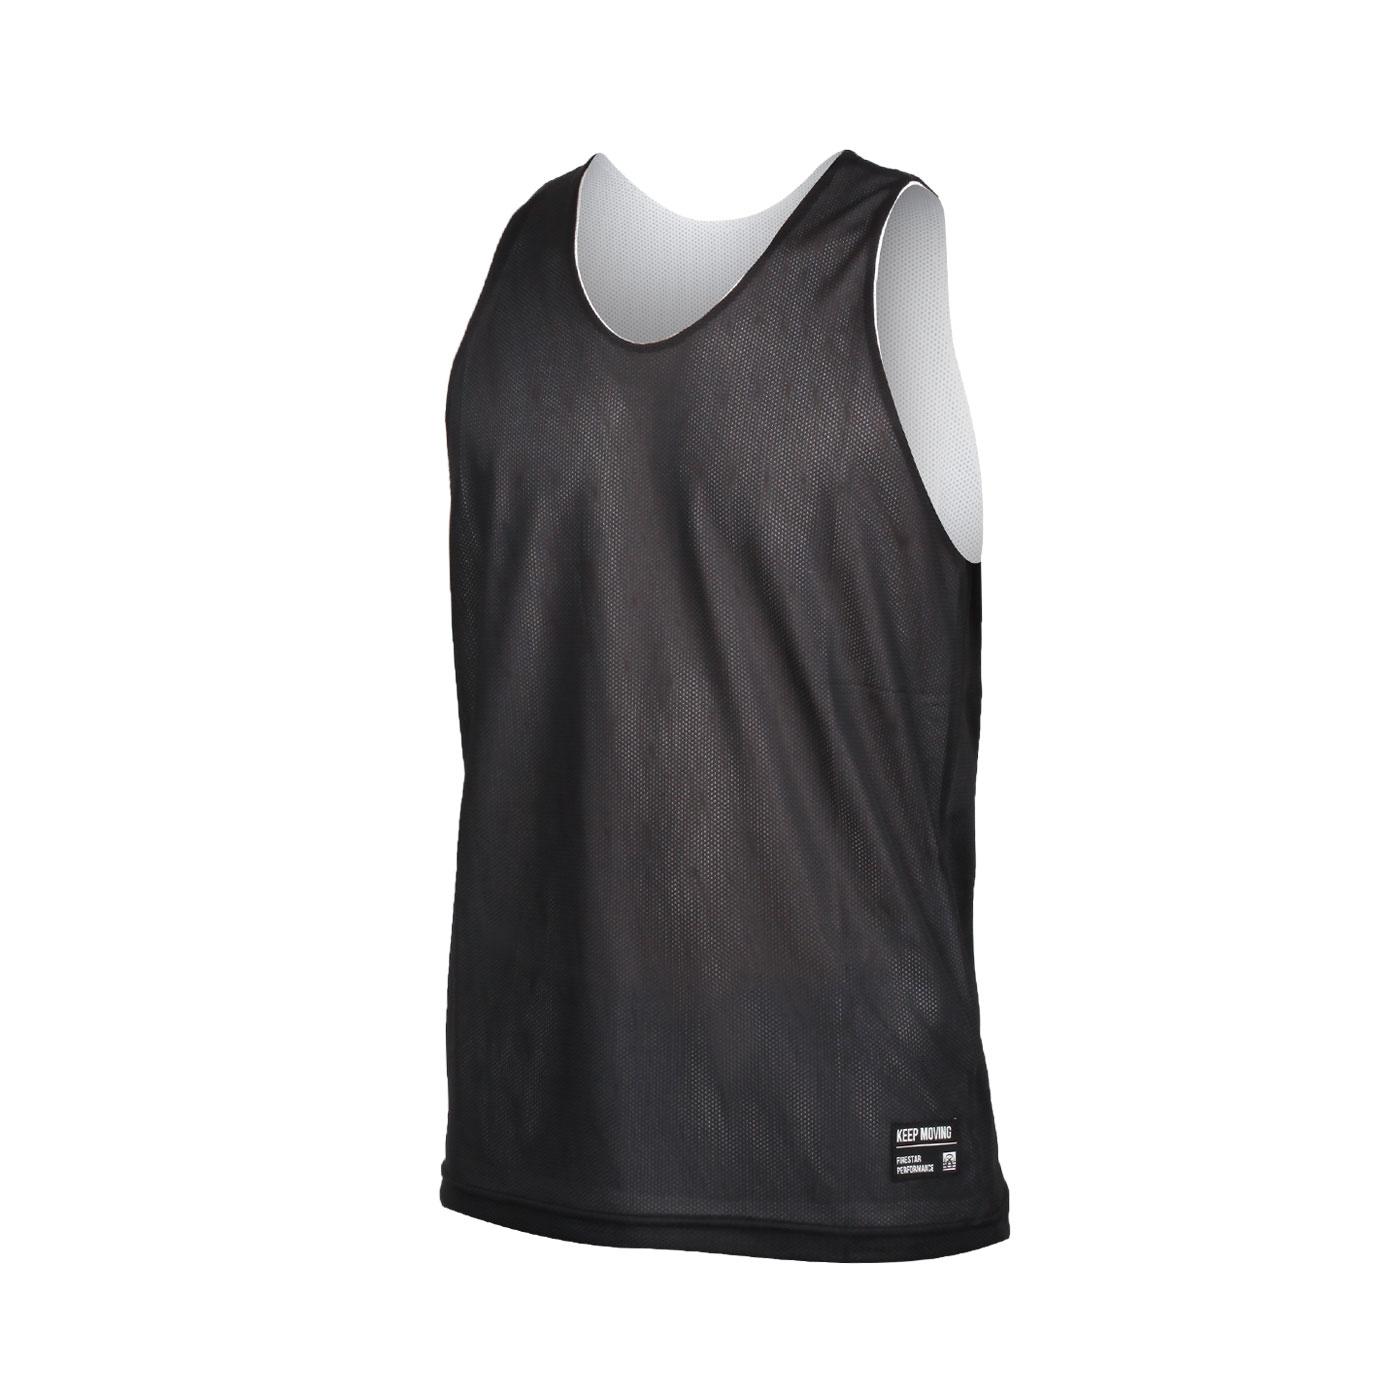 FIRESTAR 男款雙面訓練籃球背心 B1707-15 - 黑白